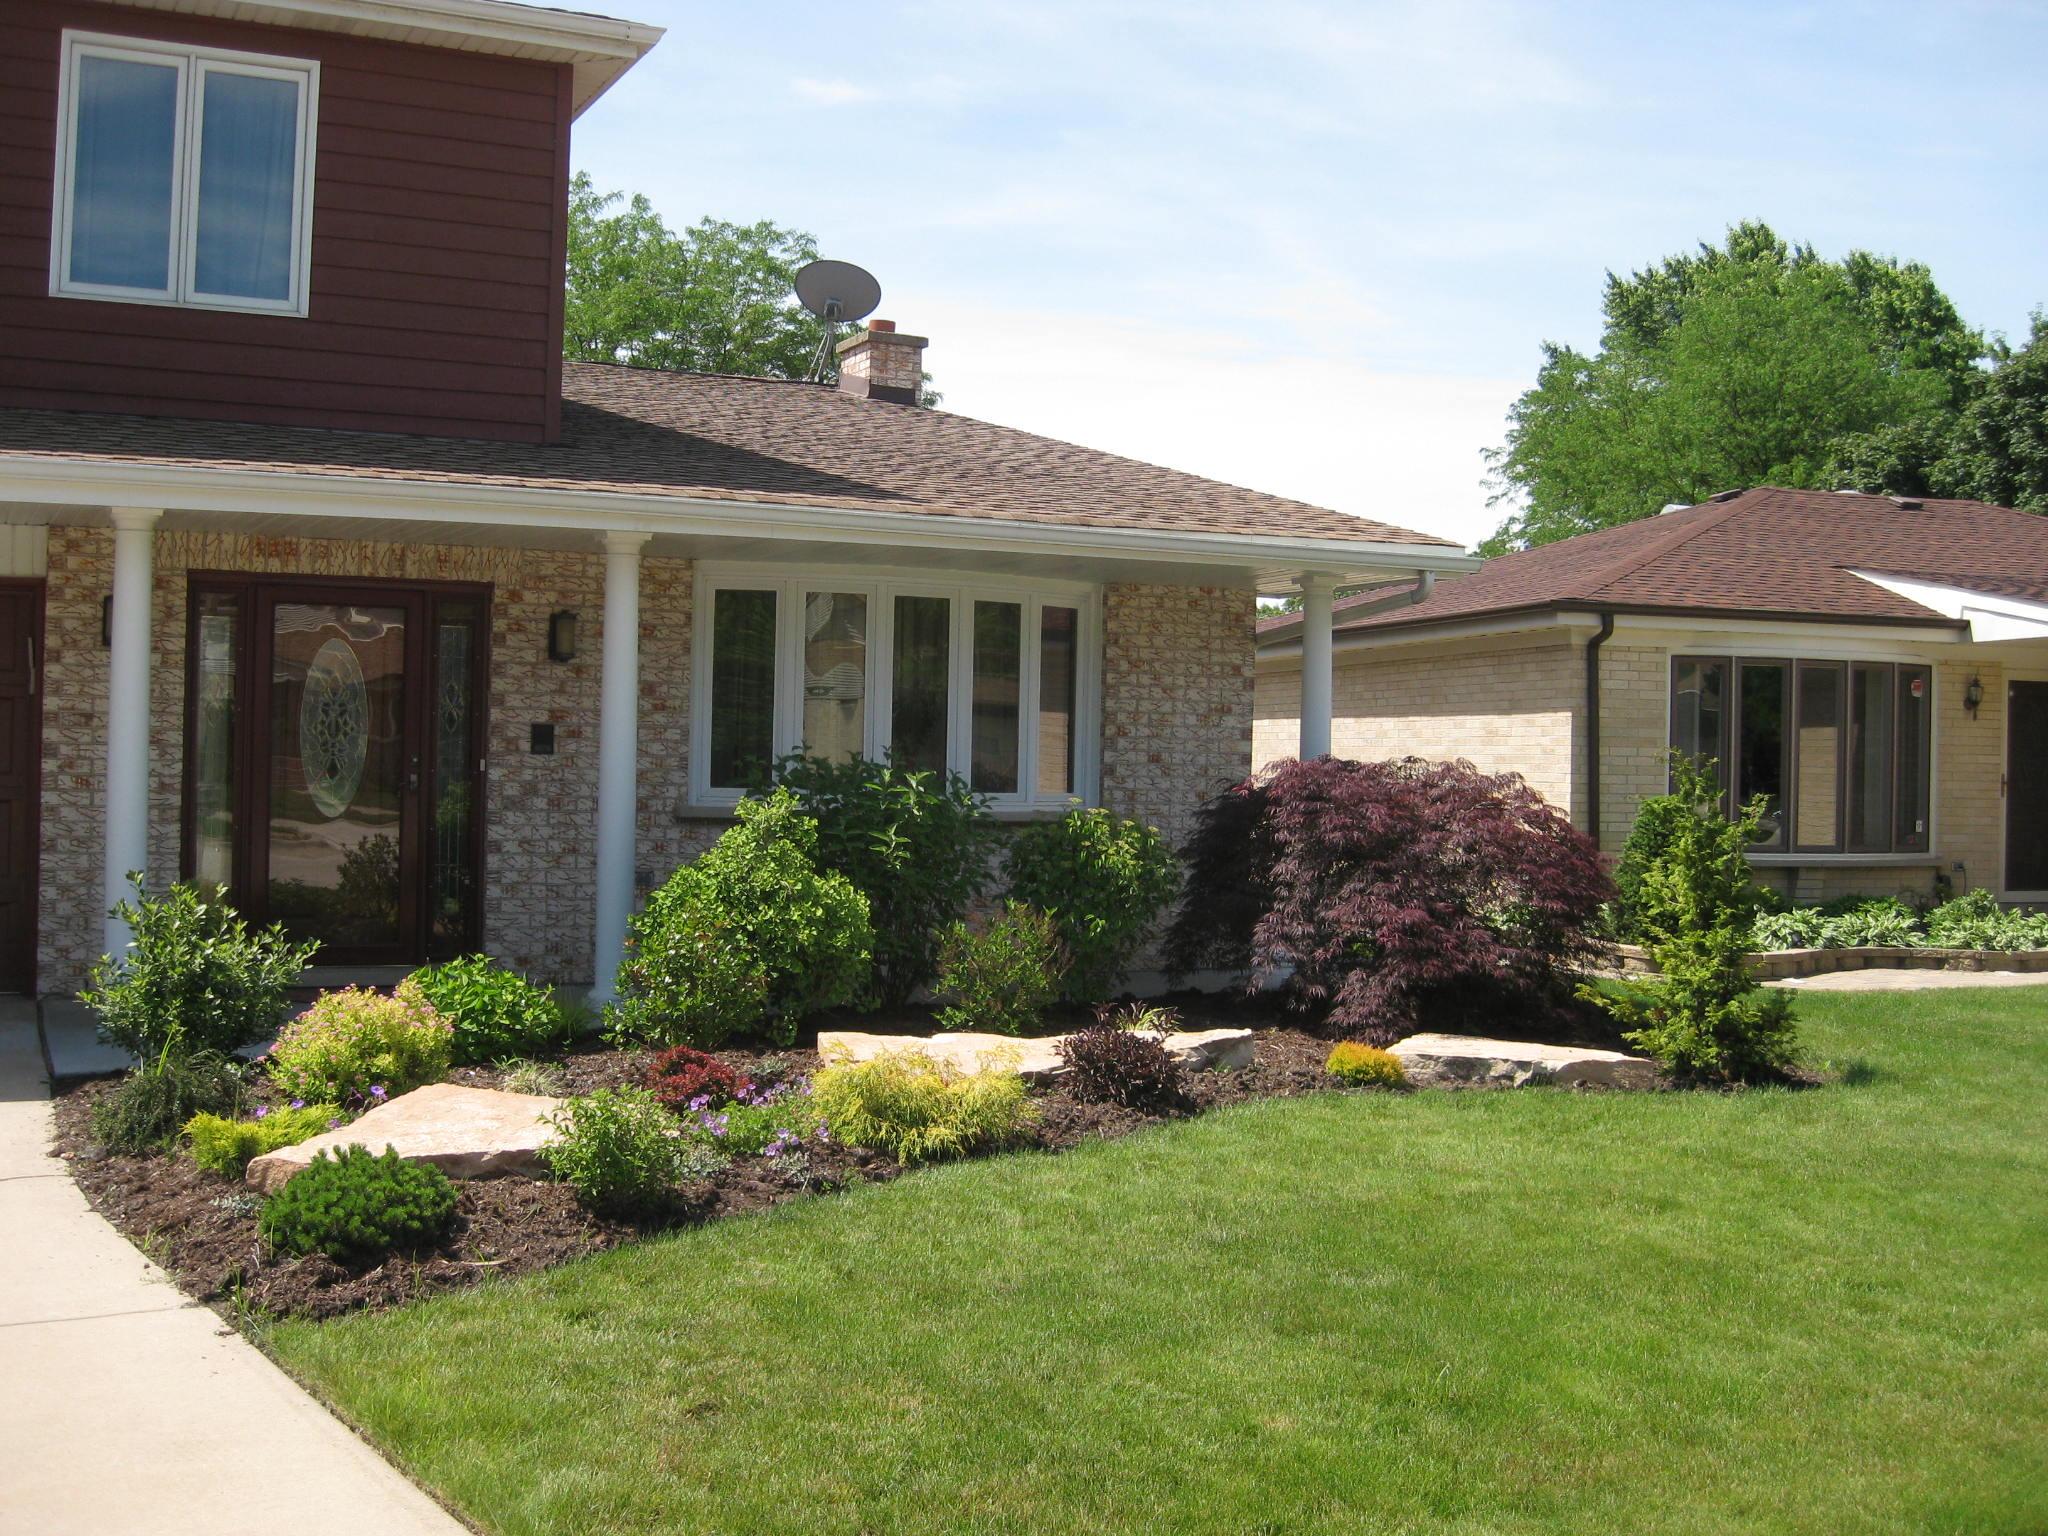 front-yard-landscape-house-landscape-landscaping-ideas-landscaping-design-entrancing-landscaping-ideas-for-front-of-two-story-house-landscaping-ideas-for-front-of-house-small-yard-landsc